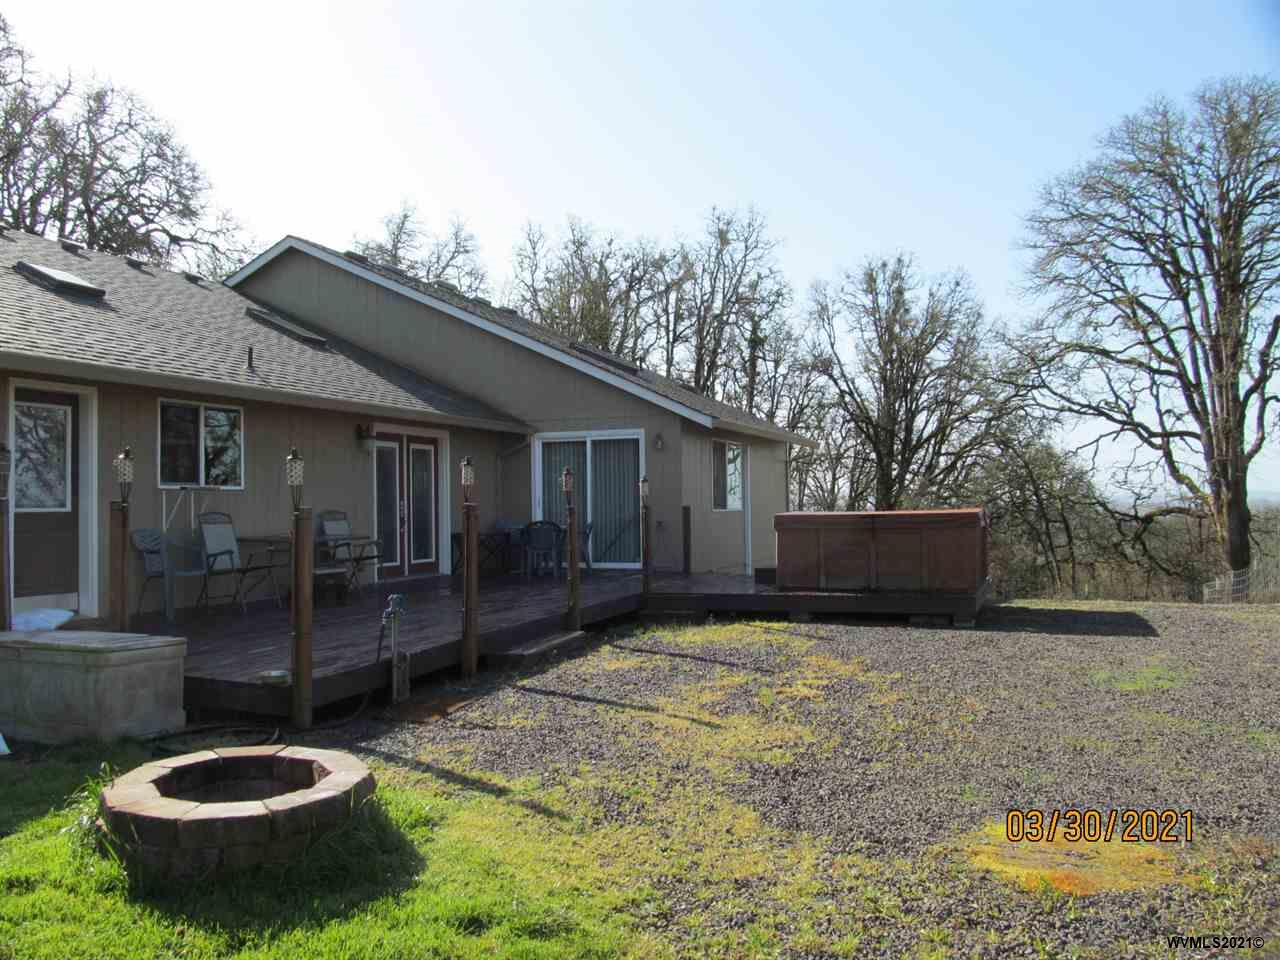 18600 SE Amity Vineyards Rd, AMITY, Oregon 97101-2331, 6 Bedrooms Bedrooms, ,3 BathroomsBathrooms,Single Family,For Sale,18600 SE Amity Vineyards Rd,1,772523